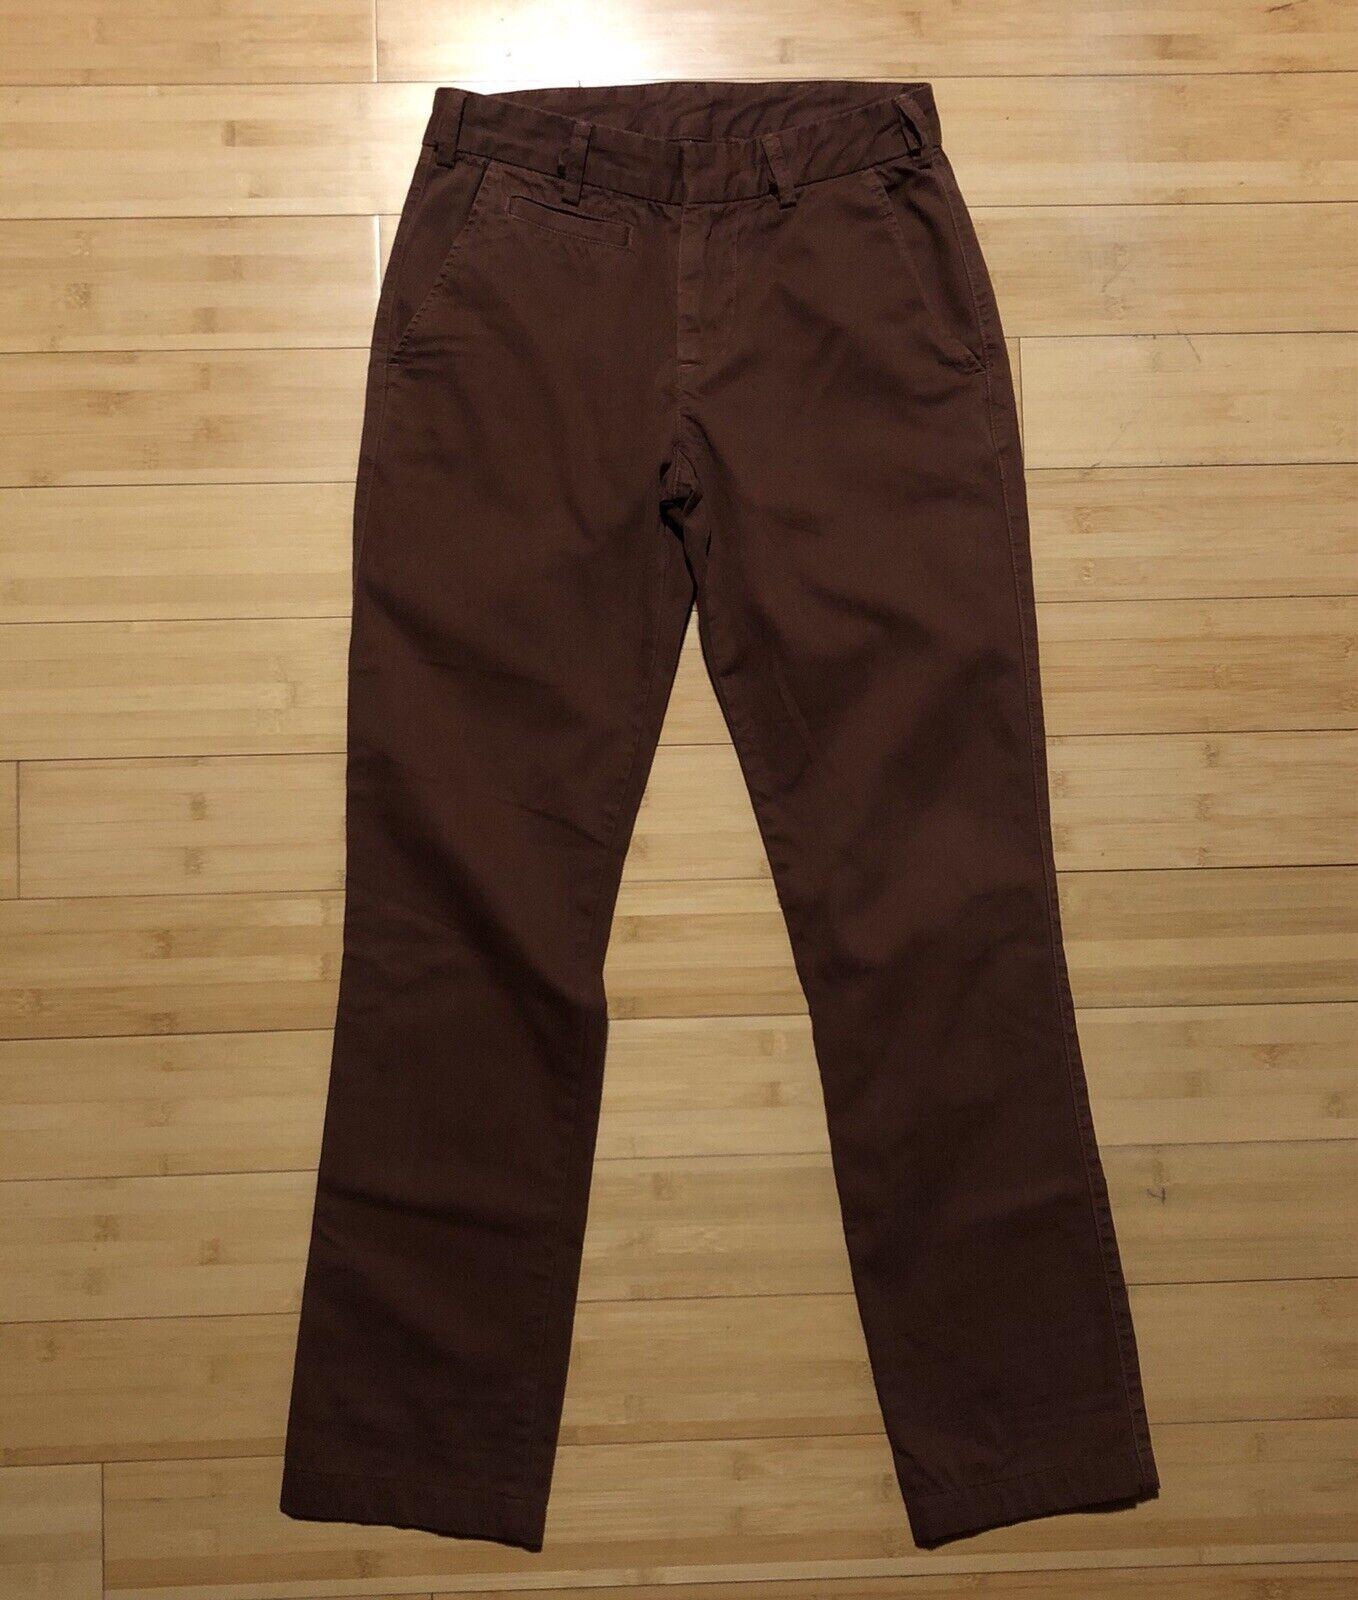 Save Khaki United S.K.U. Bedford Cord Trousers Size 28